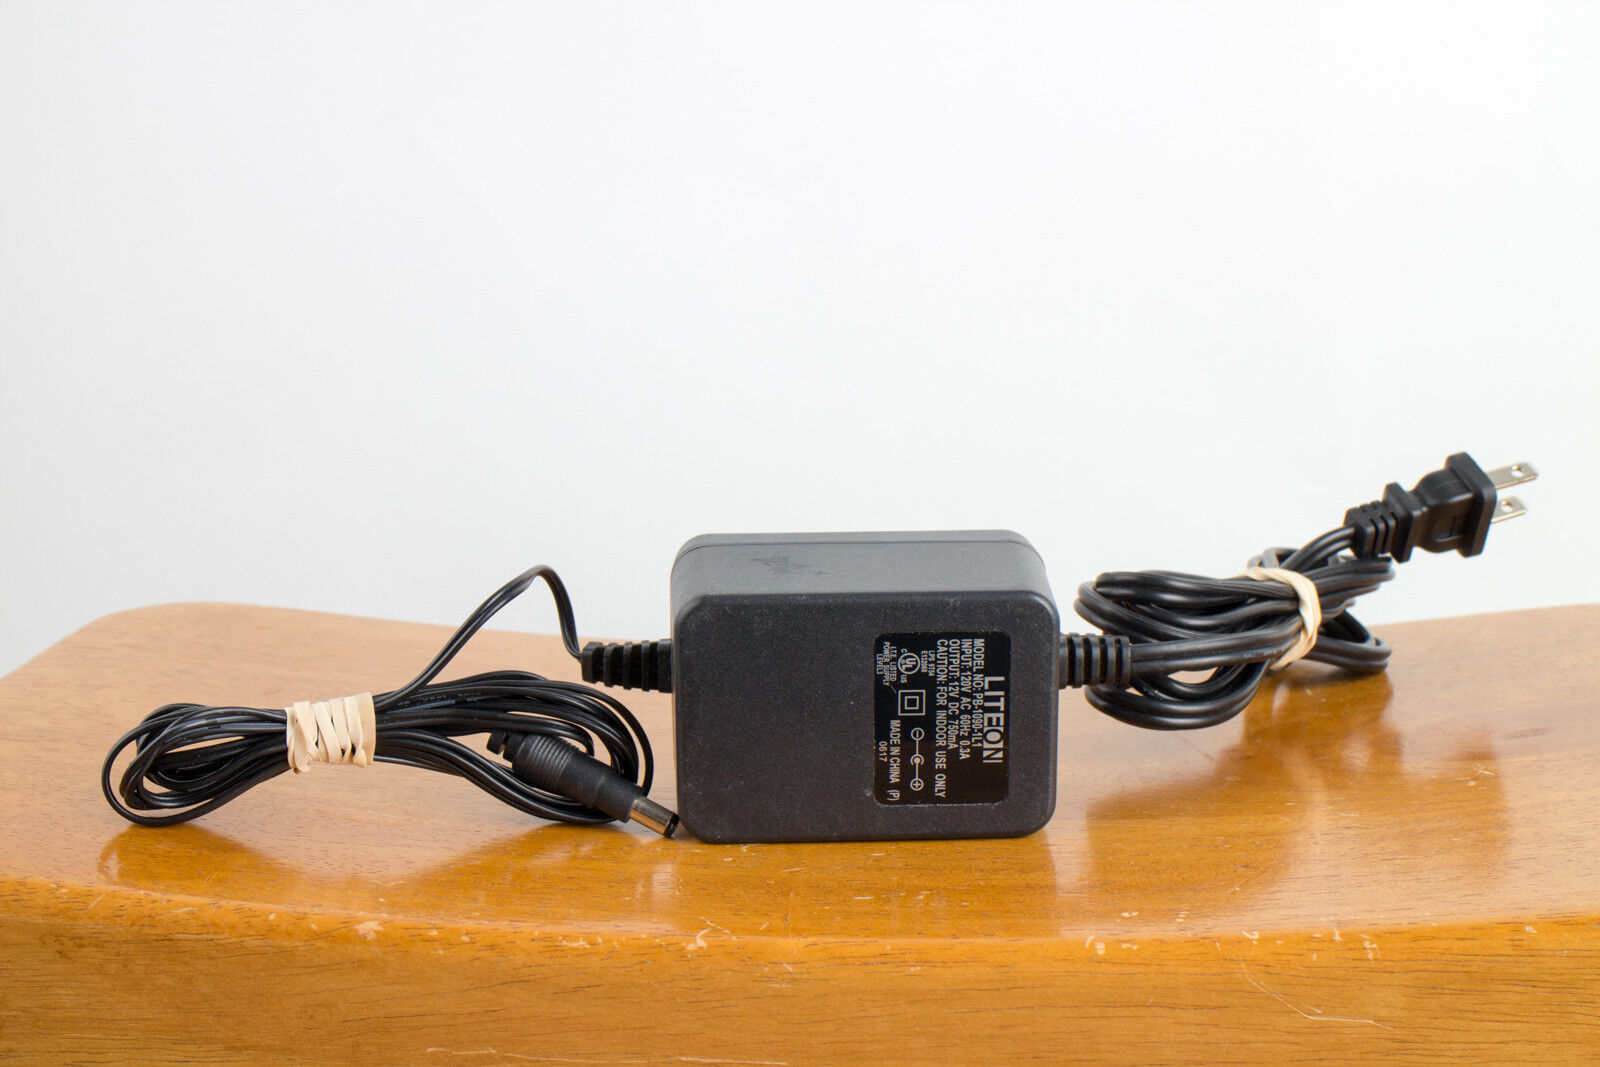 LiteOn PB-1090-1L1 120V AC 0.3A 12 V DC 750mA Power Supply Adapter